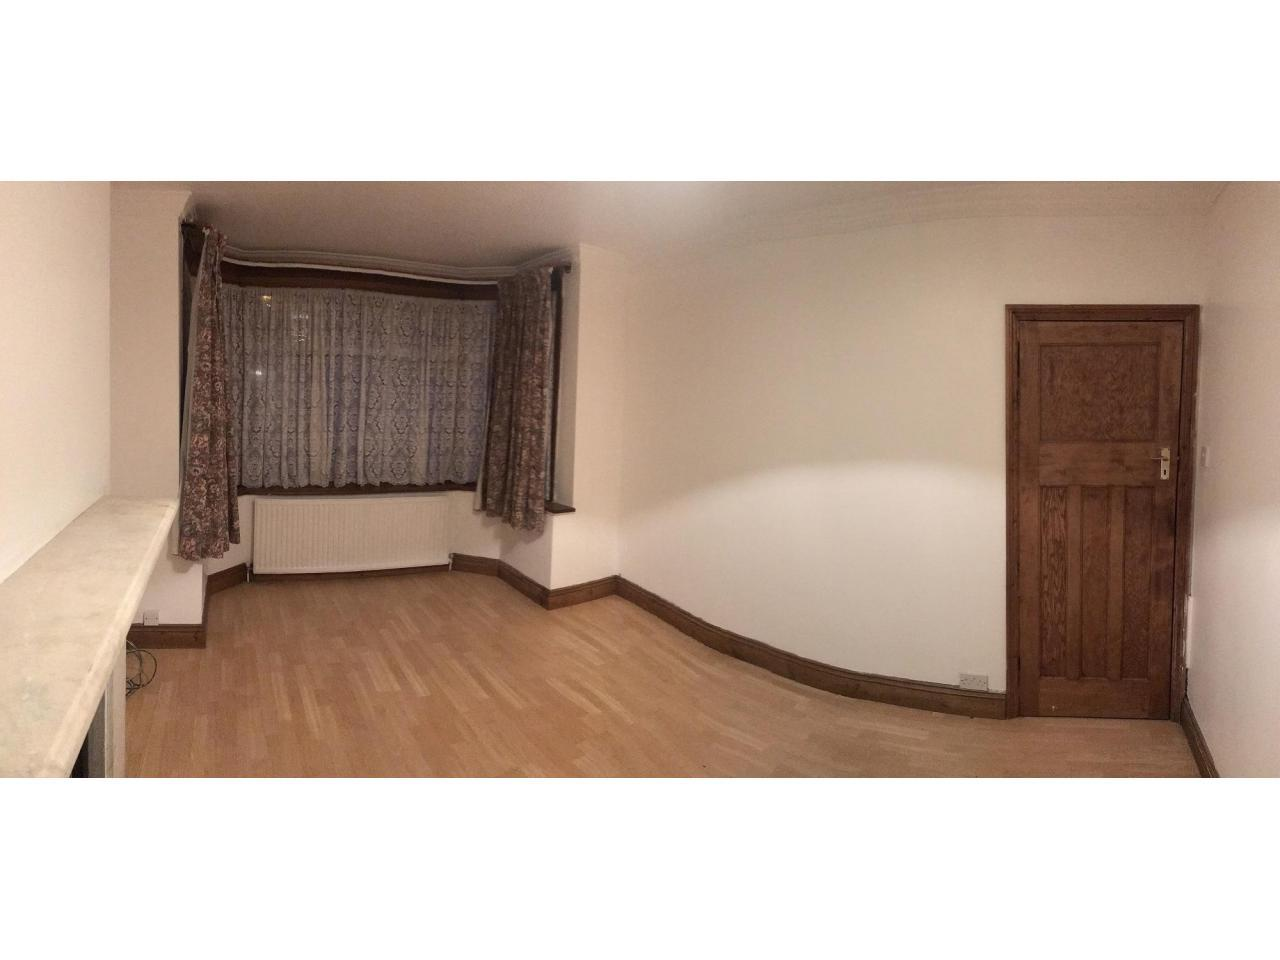 Сингл и Дабл комнаты в аренду на Neasden / Sudbury Hill / Harrow / Greenford. - 3